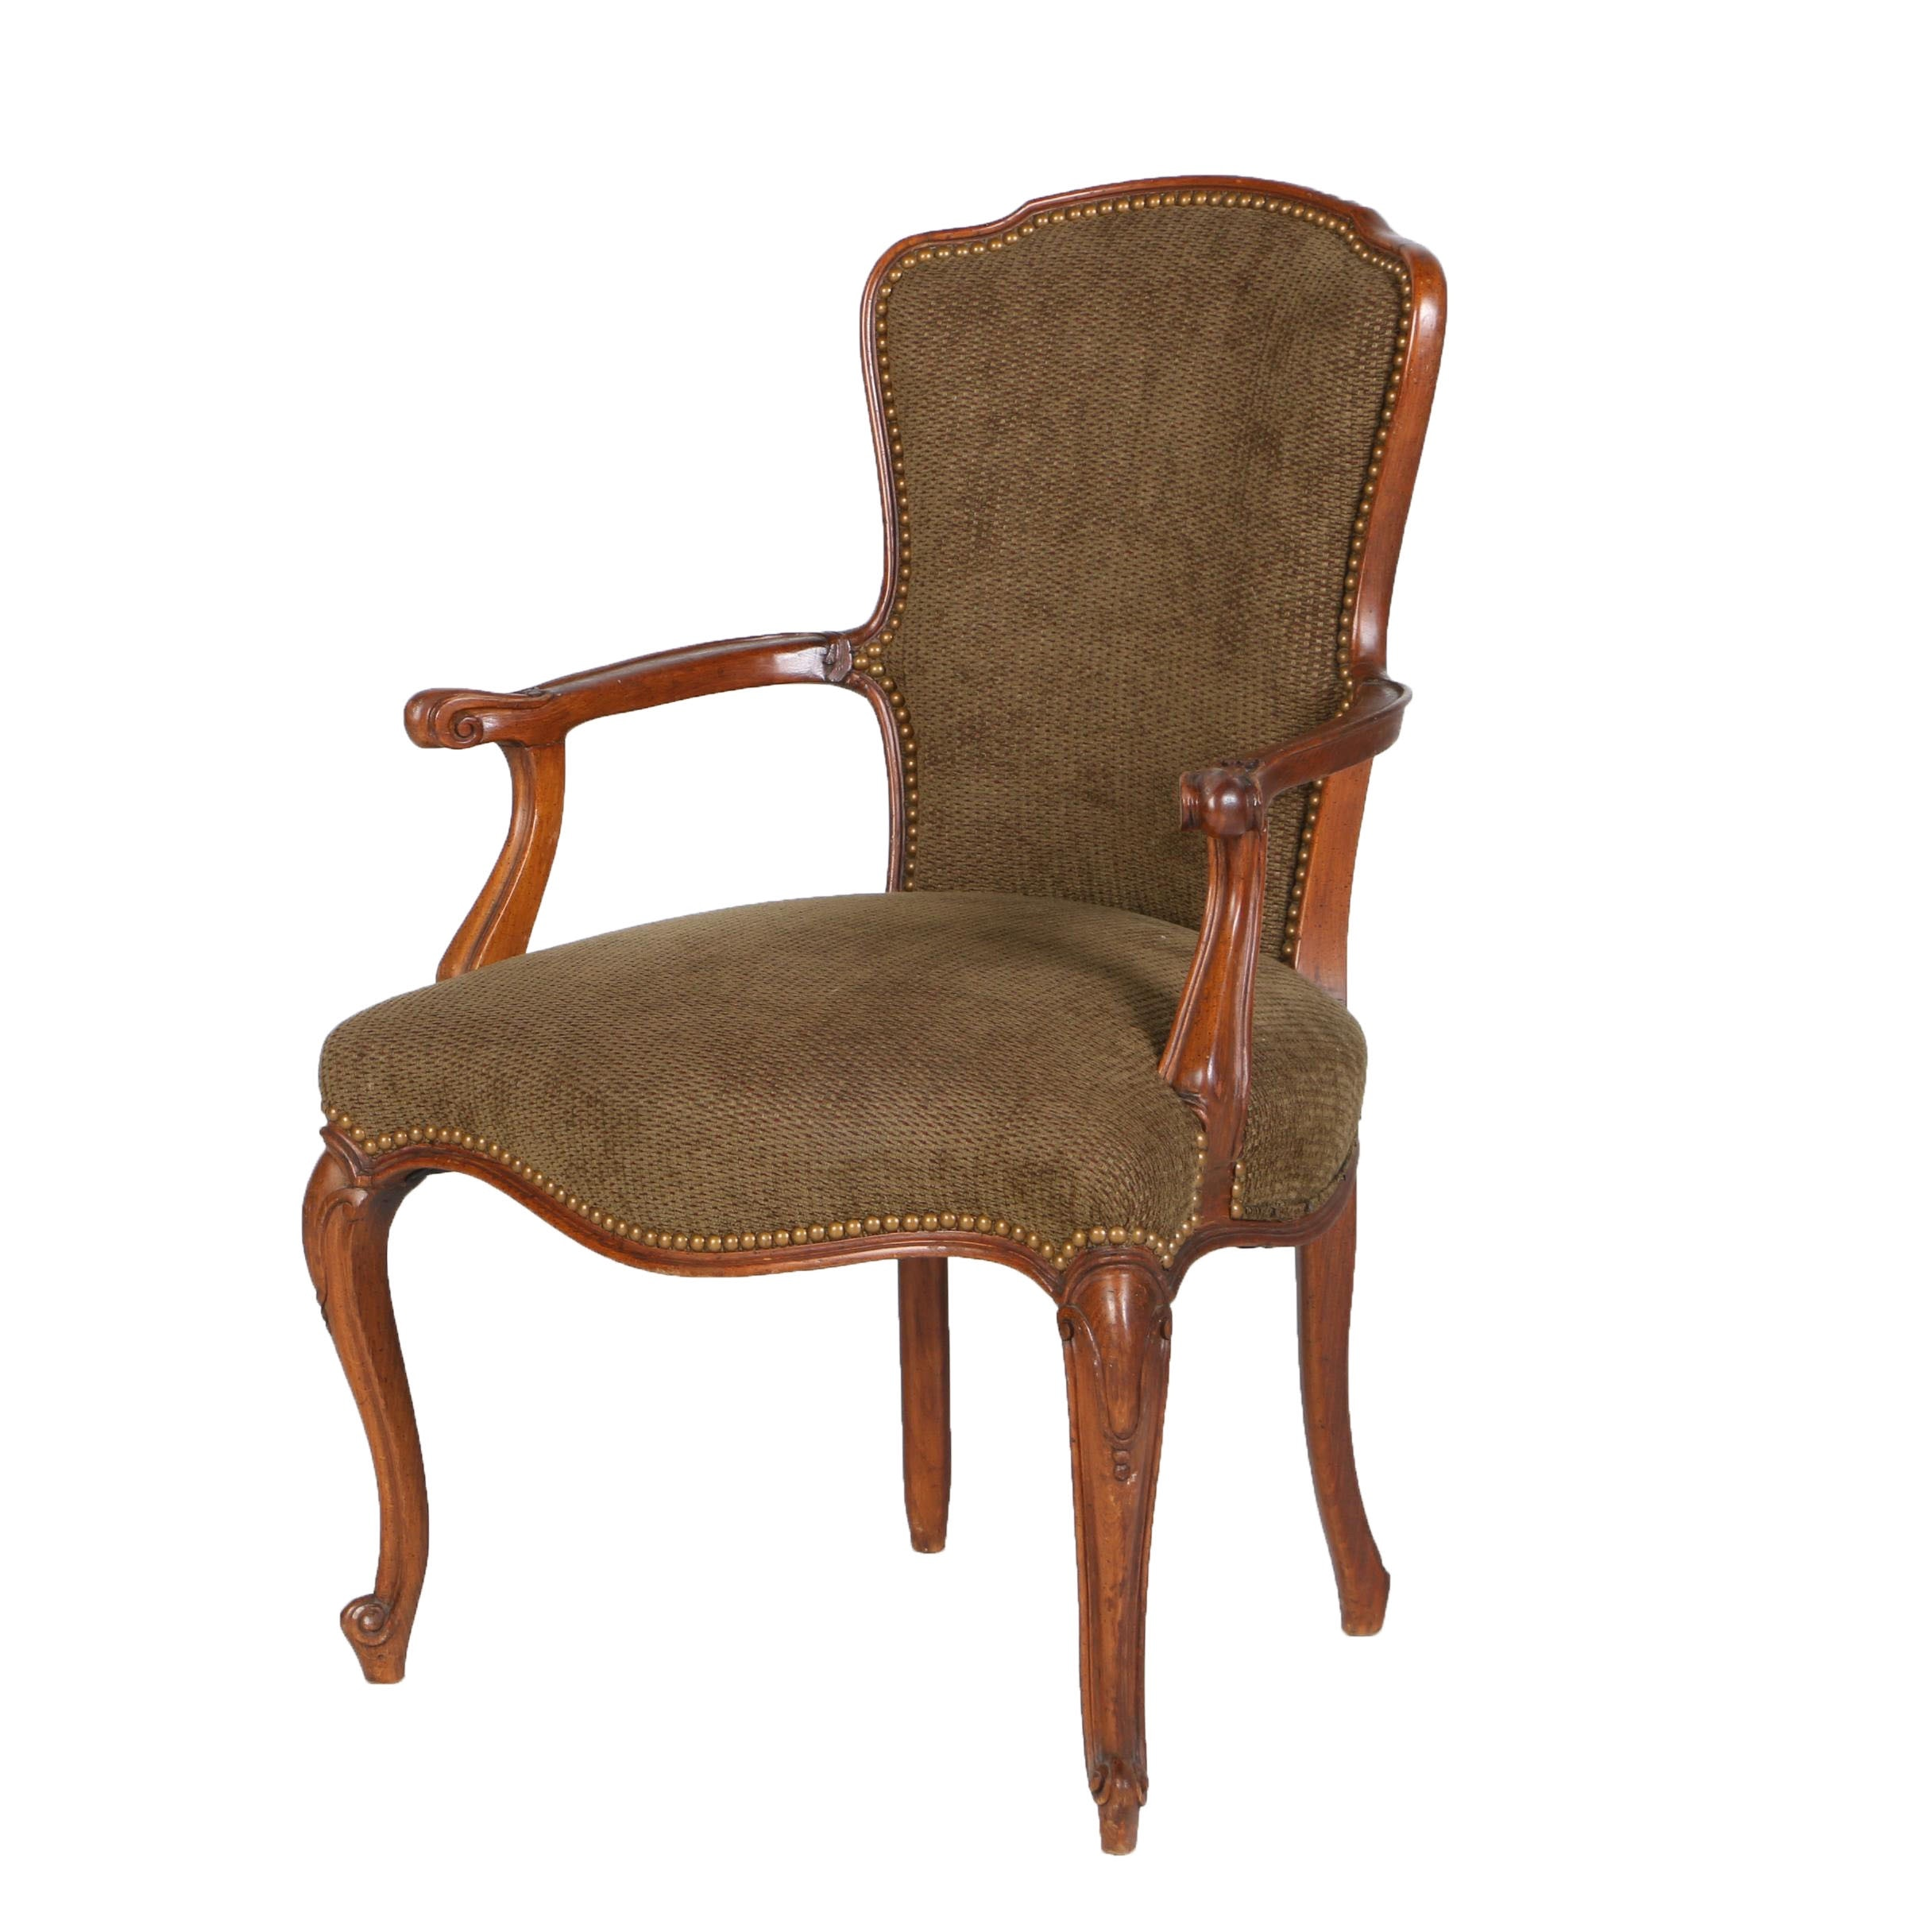 Louis XV Style Beechwood Fauteuil, 20th Century